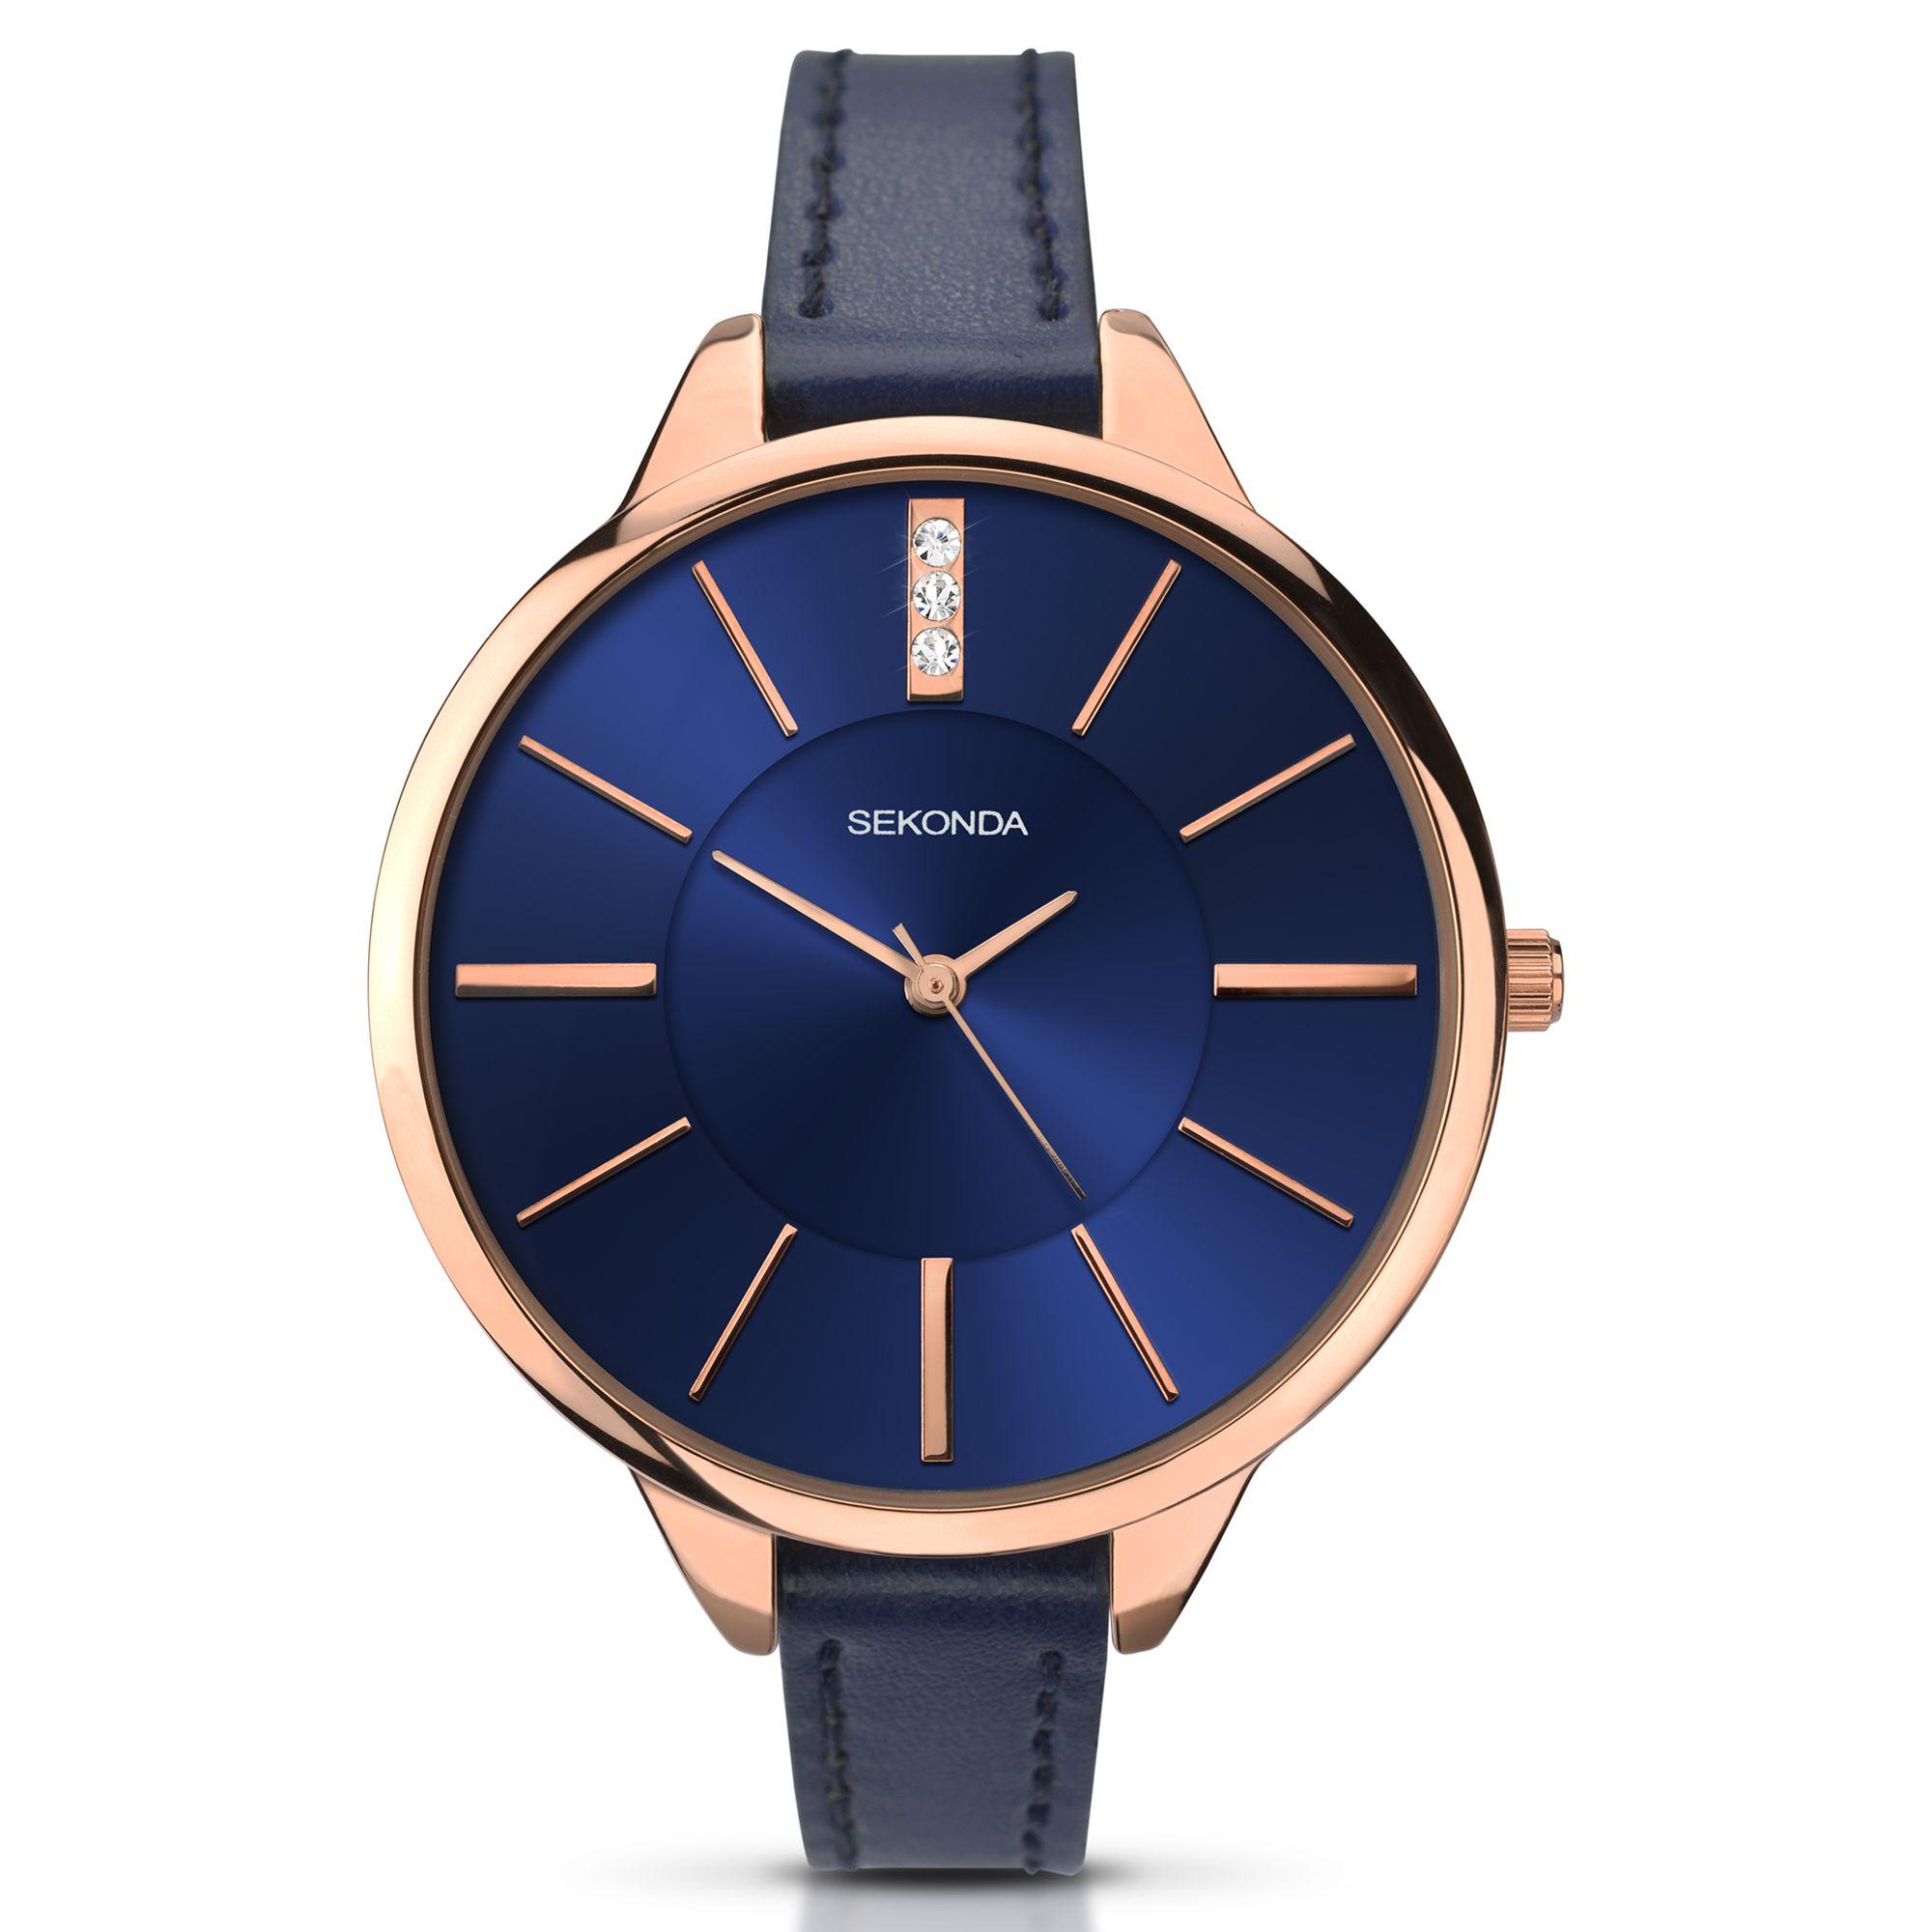 Sekonda Sekonda 2144.27 Women's Diamante Faux Leather Strap Watch, Blue